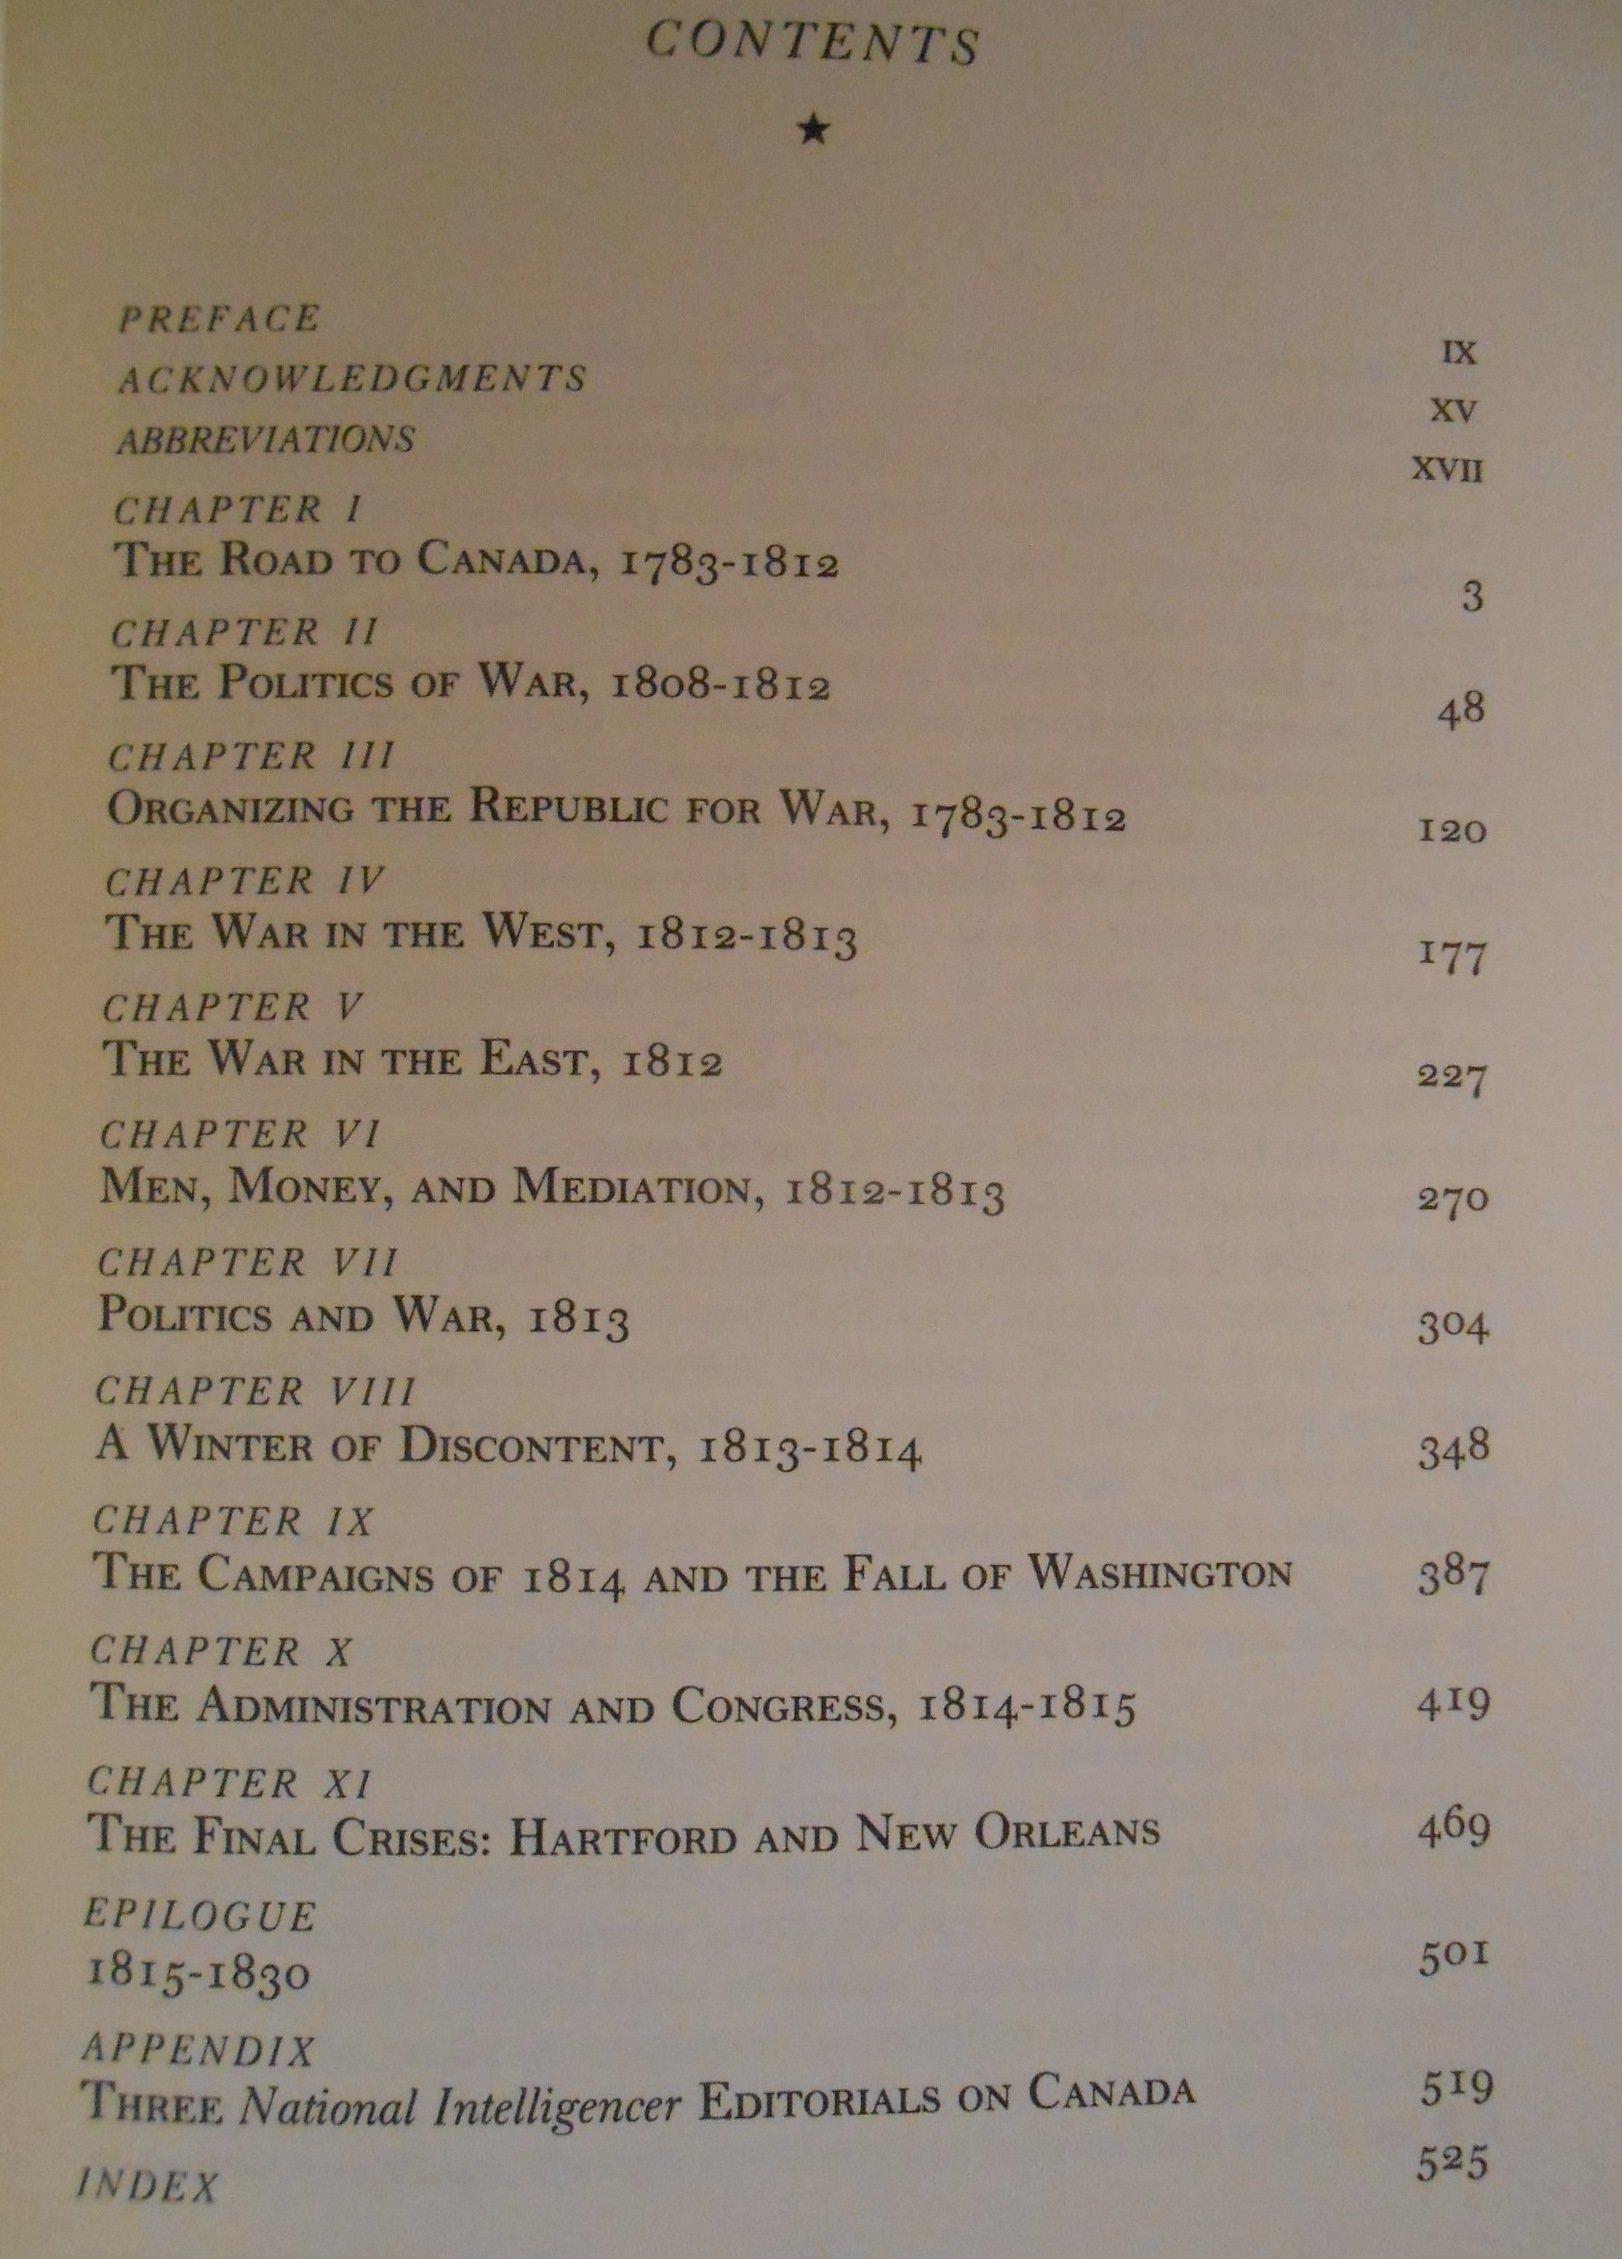 Mr. Madison's War: Politics, Diplomacy, and Warfare in the Early American  Republic, 1783-1830: John C. Stagg: 9780691101507: Books - Amazon.ca